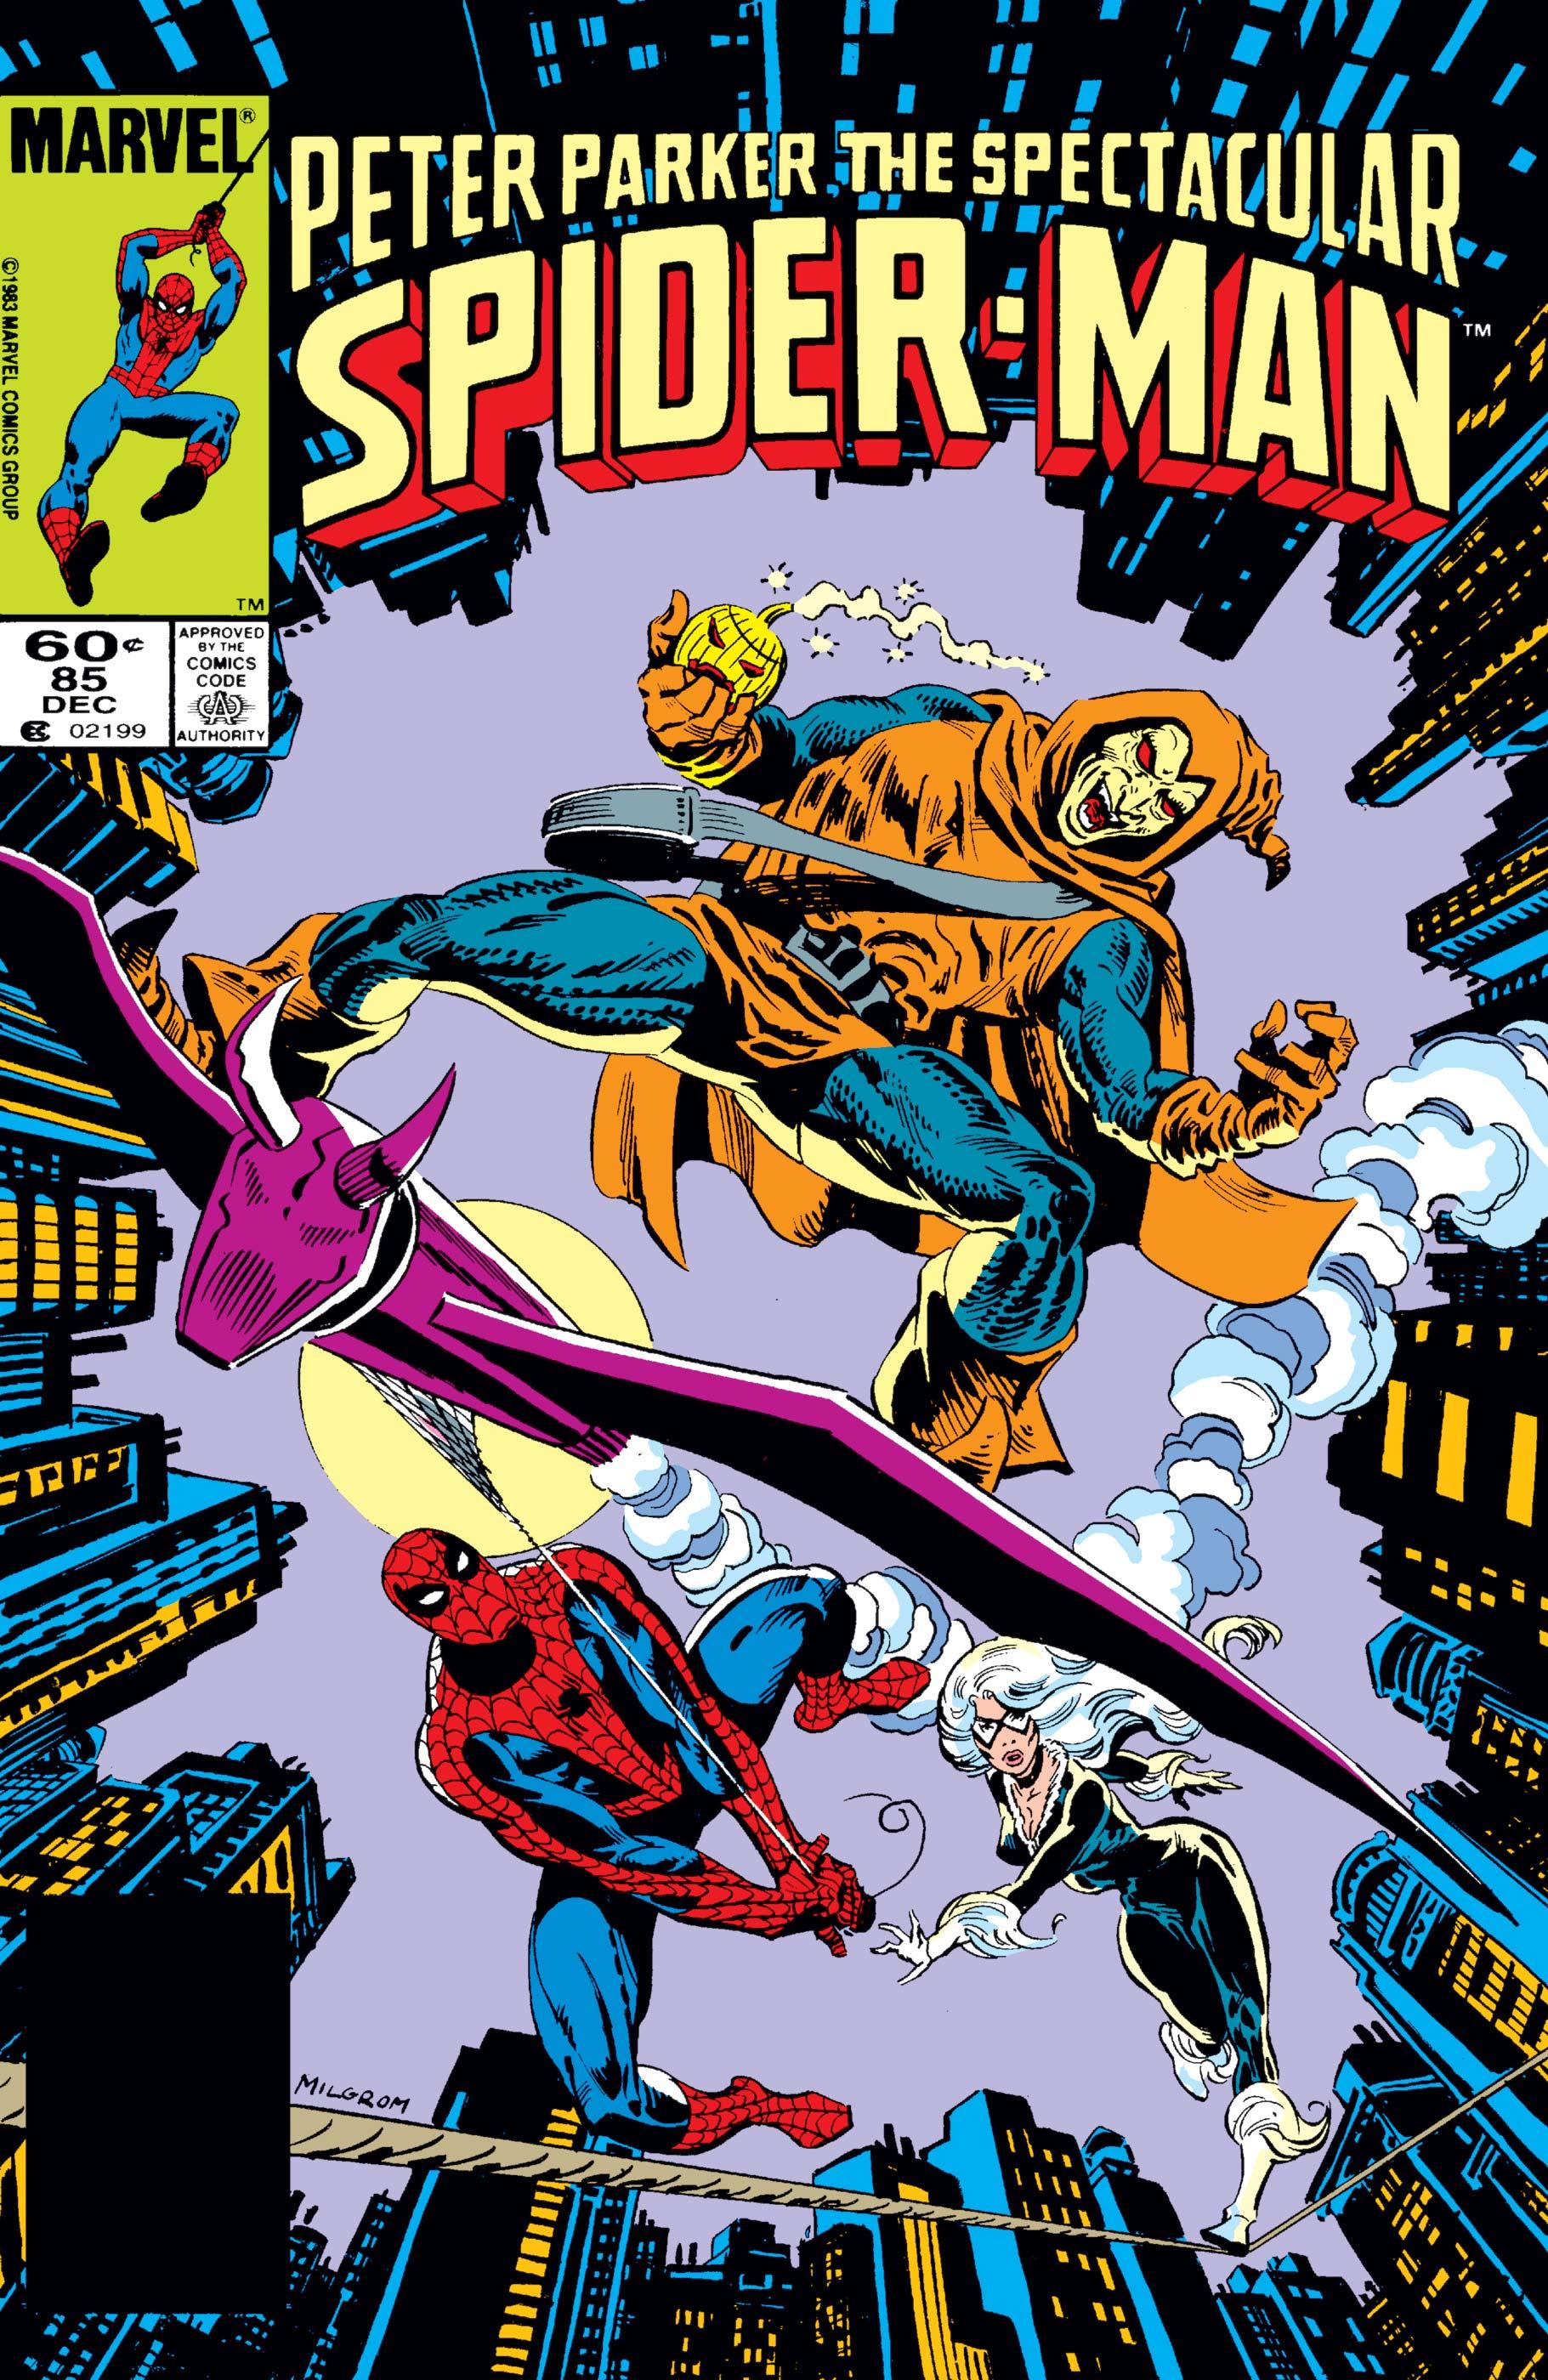 Peter Parker, The Spectacular Spider-Man Vol 1 85.jpg